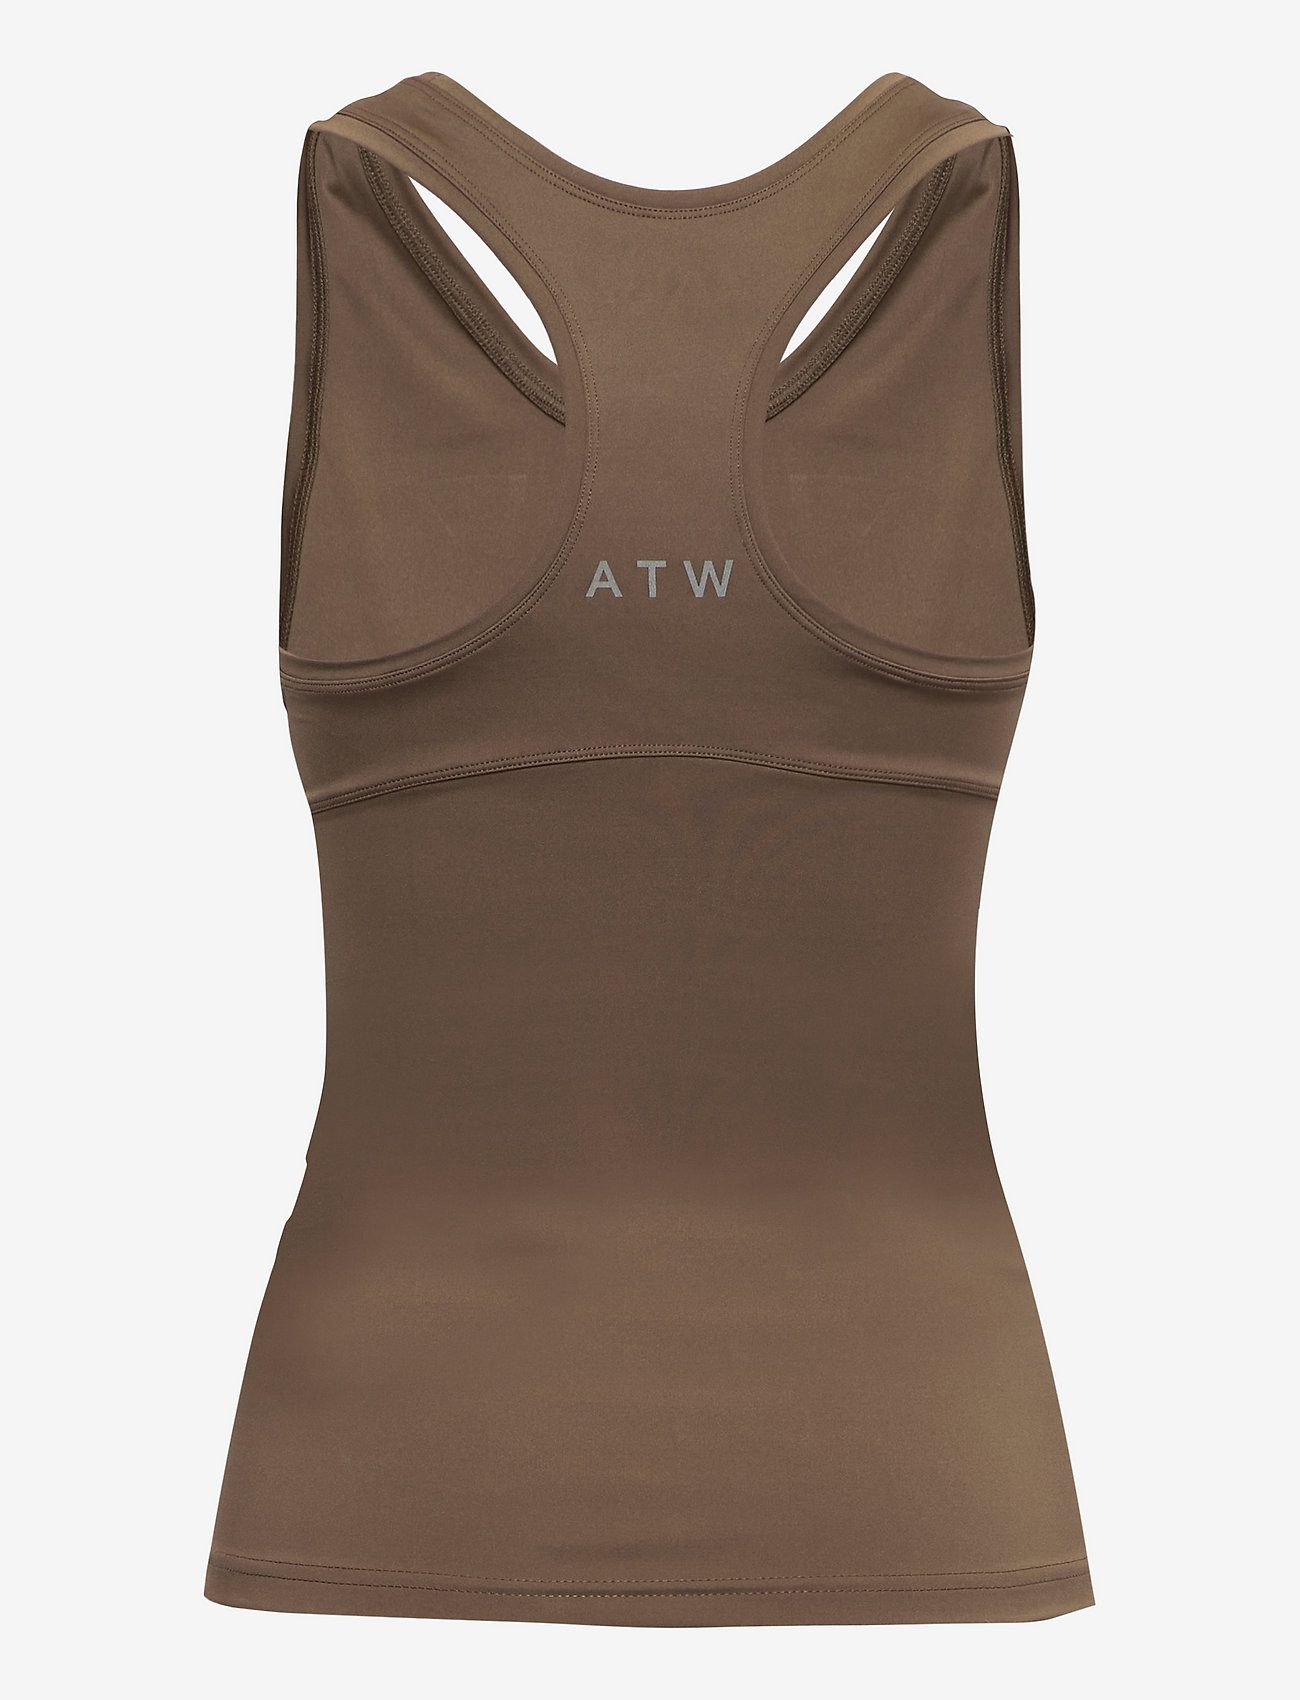 HALO - HALO WOMENS RACERBACK TANK - sleeveless tops - vintage brown - 1